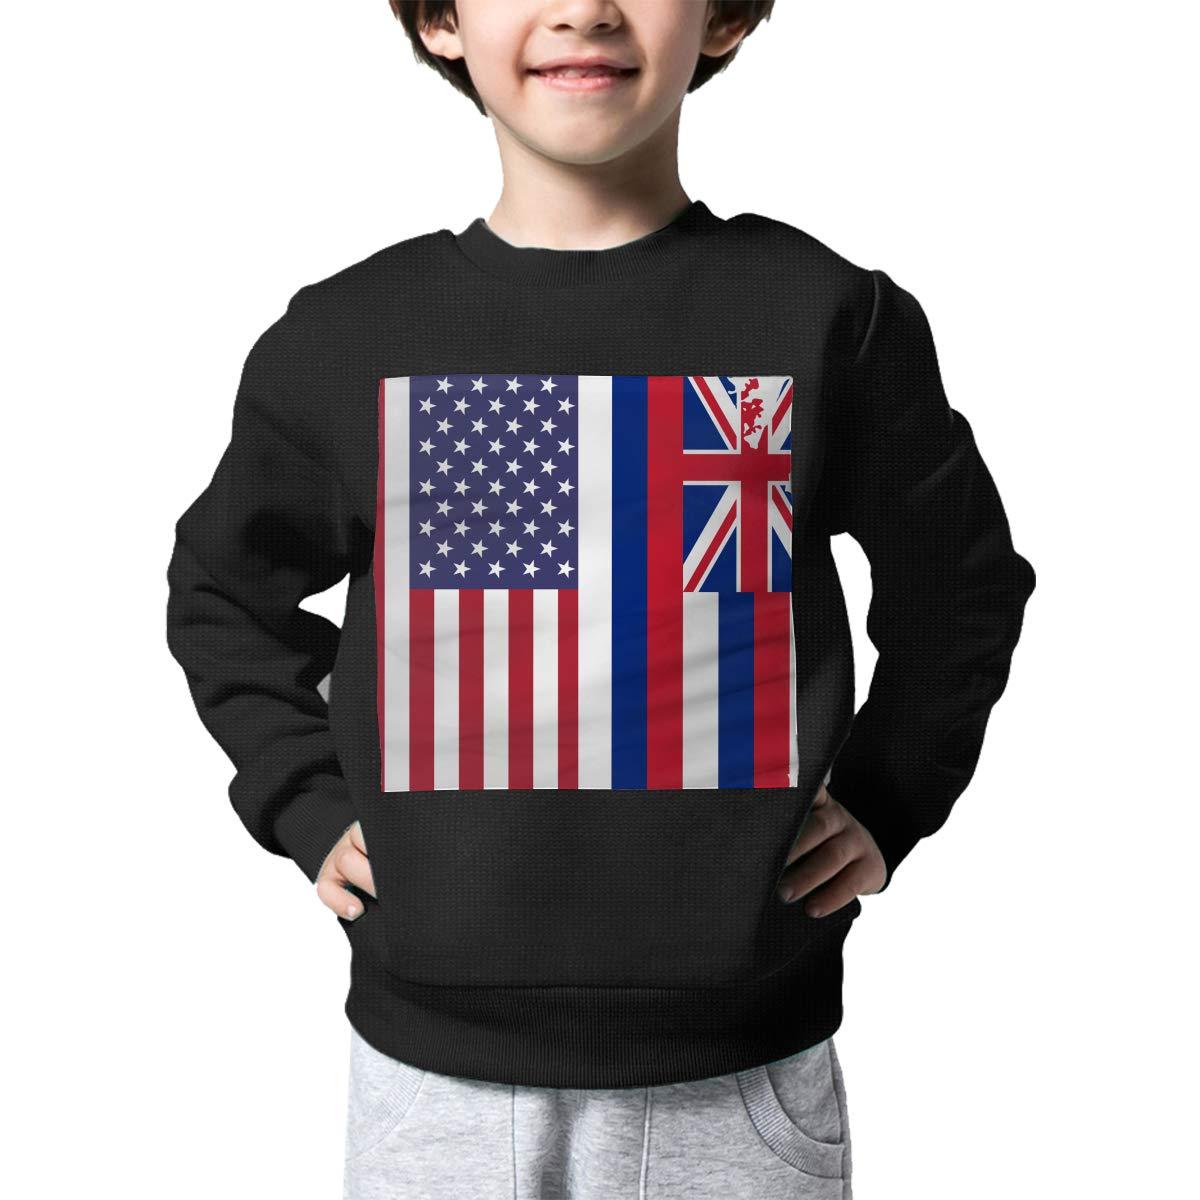 NJKM5MJ Boys Girls American Hawaii State Flag Lovely Sweaters Soft Warm Unisex Children Kids Sweater